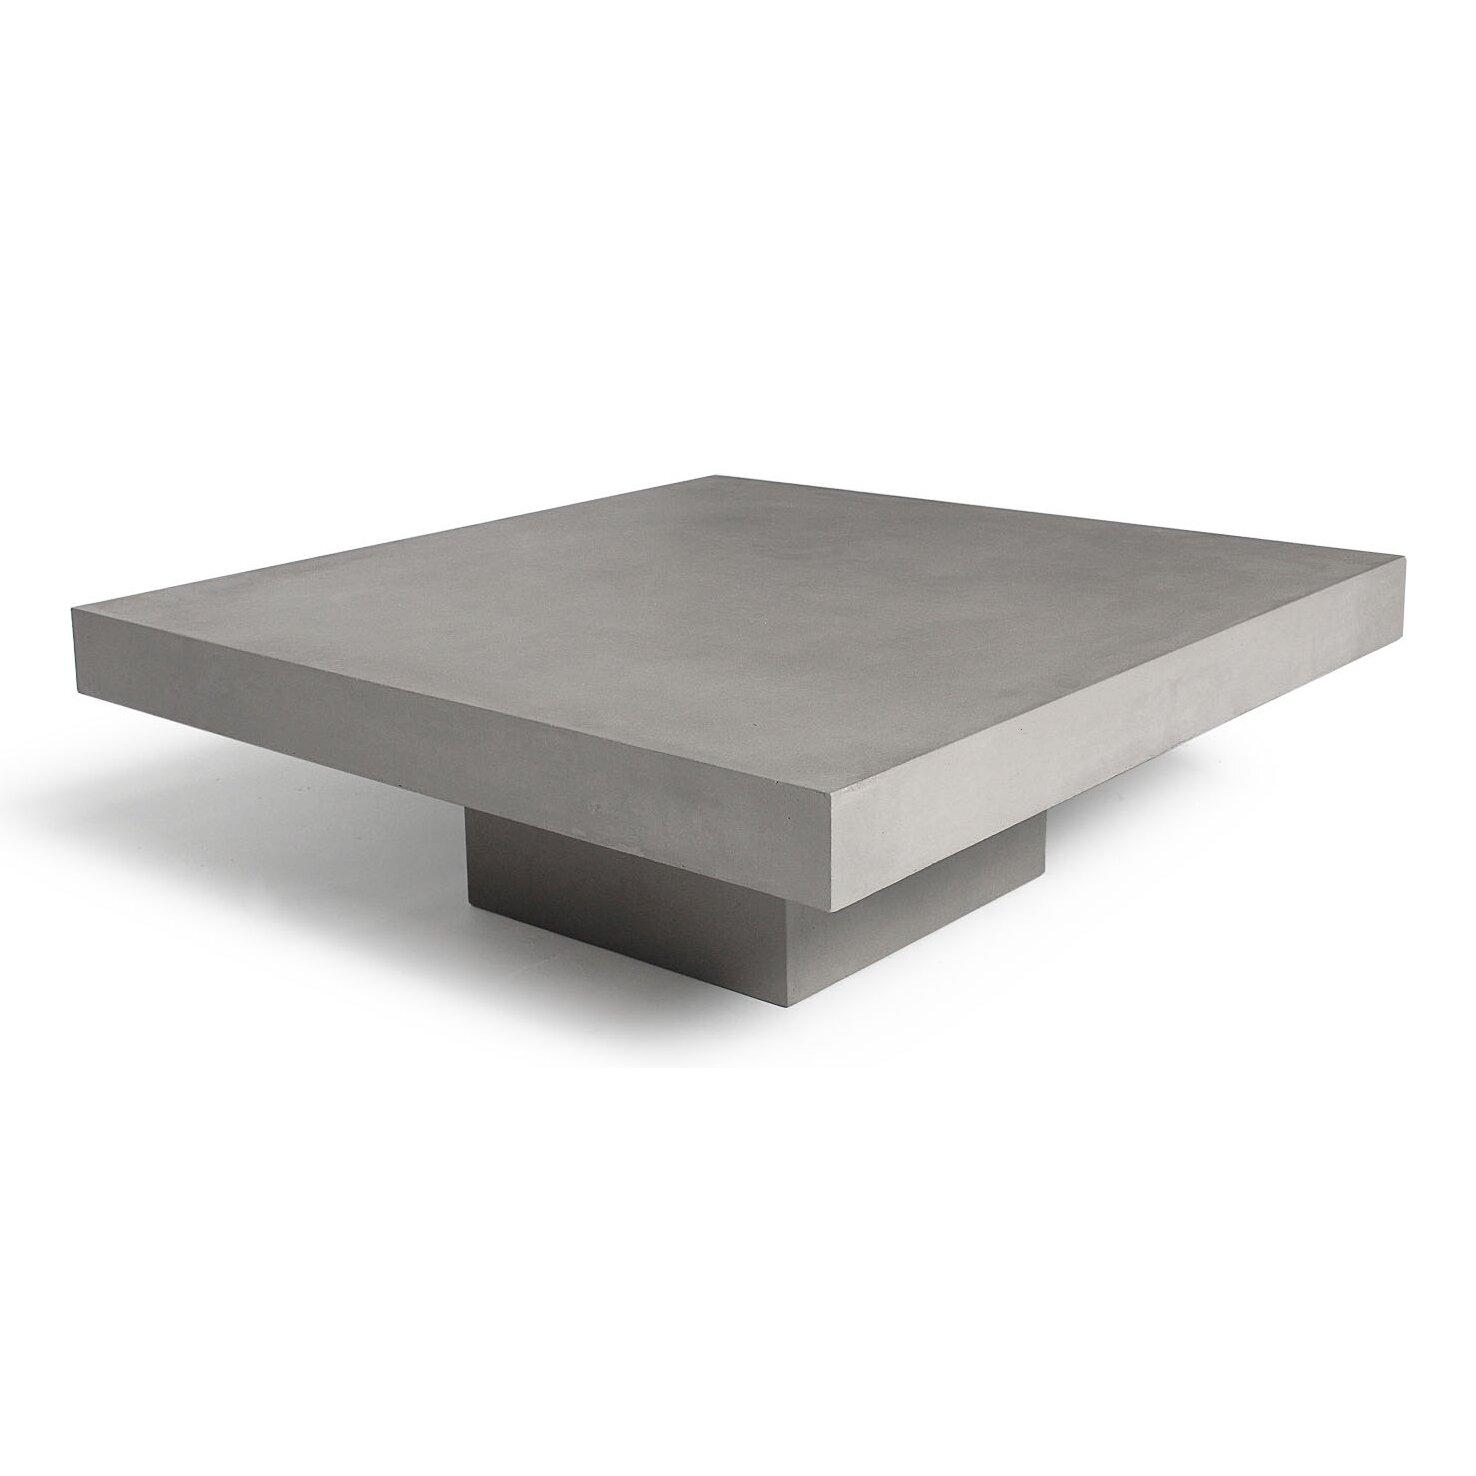 lyon beton t coffee table reviews wayfair. Black Bedroom Furniture Sets. Home Design Ideas